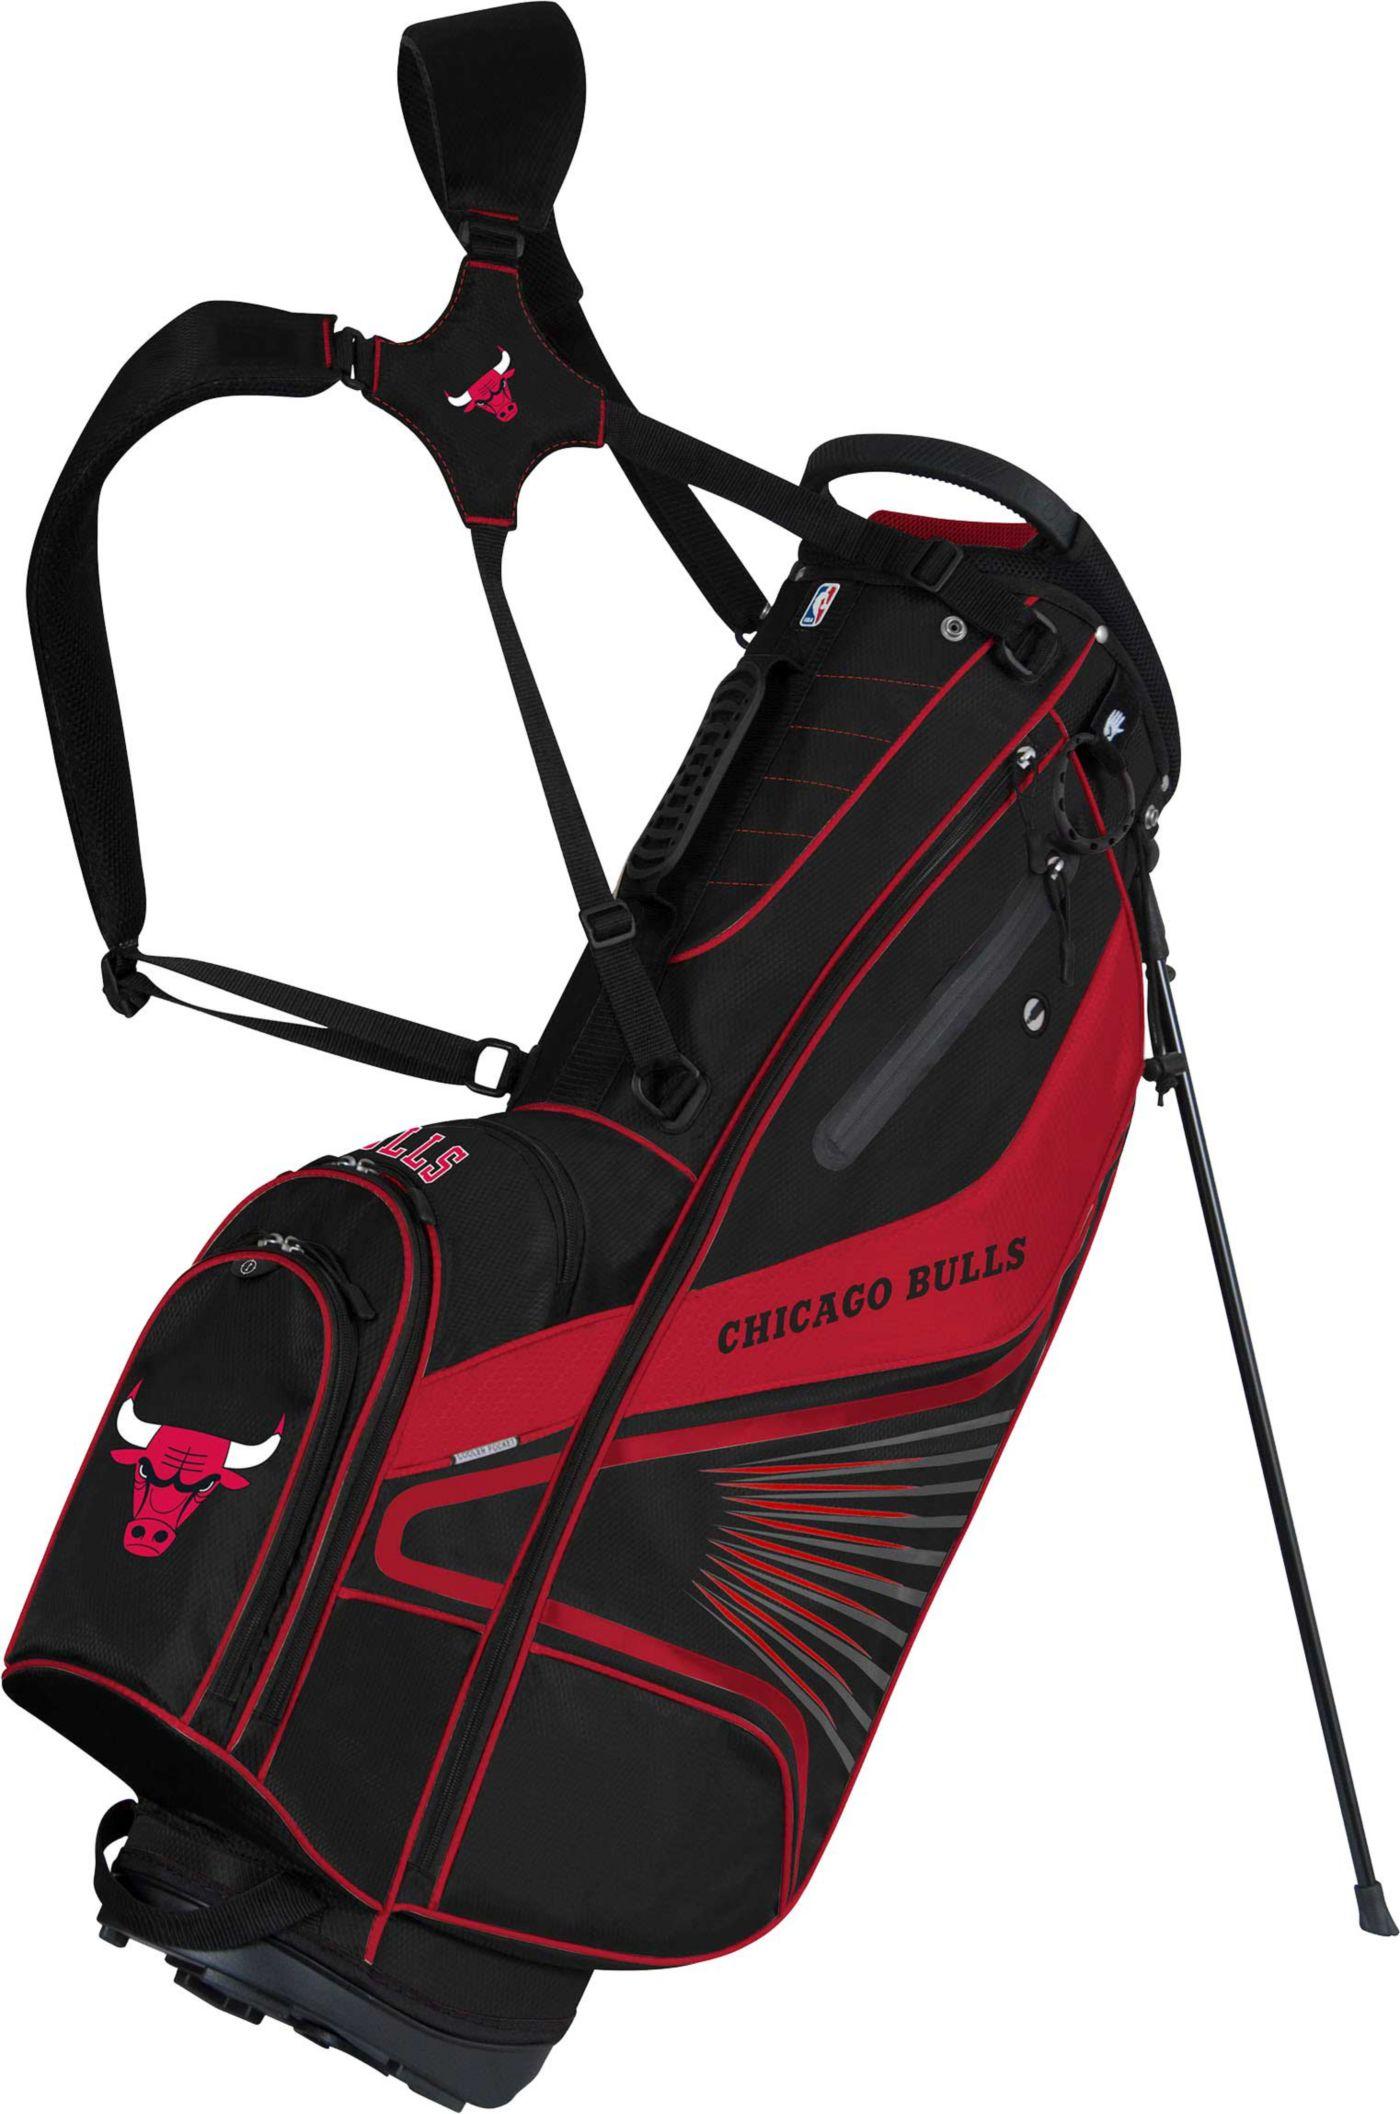 Team Effort Chicago Bulls Gridiron III Stand Bag